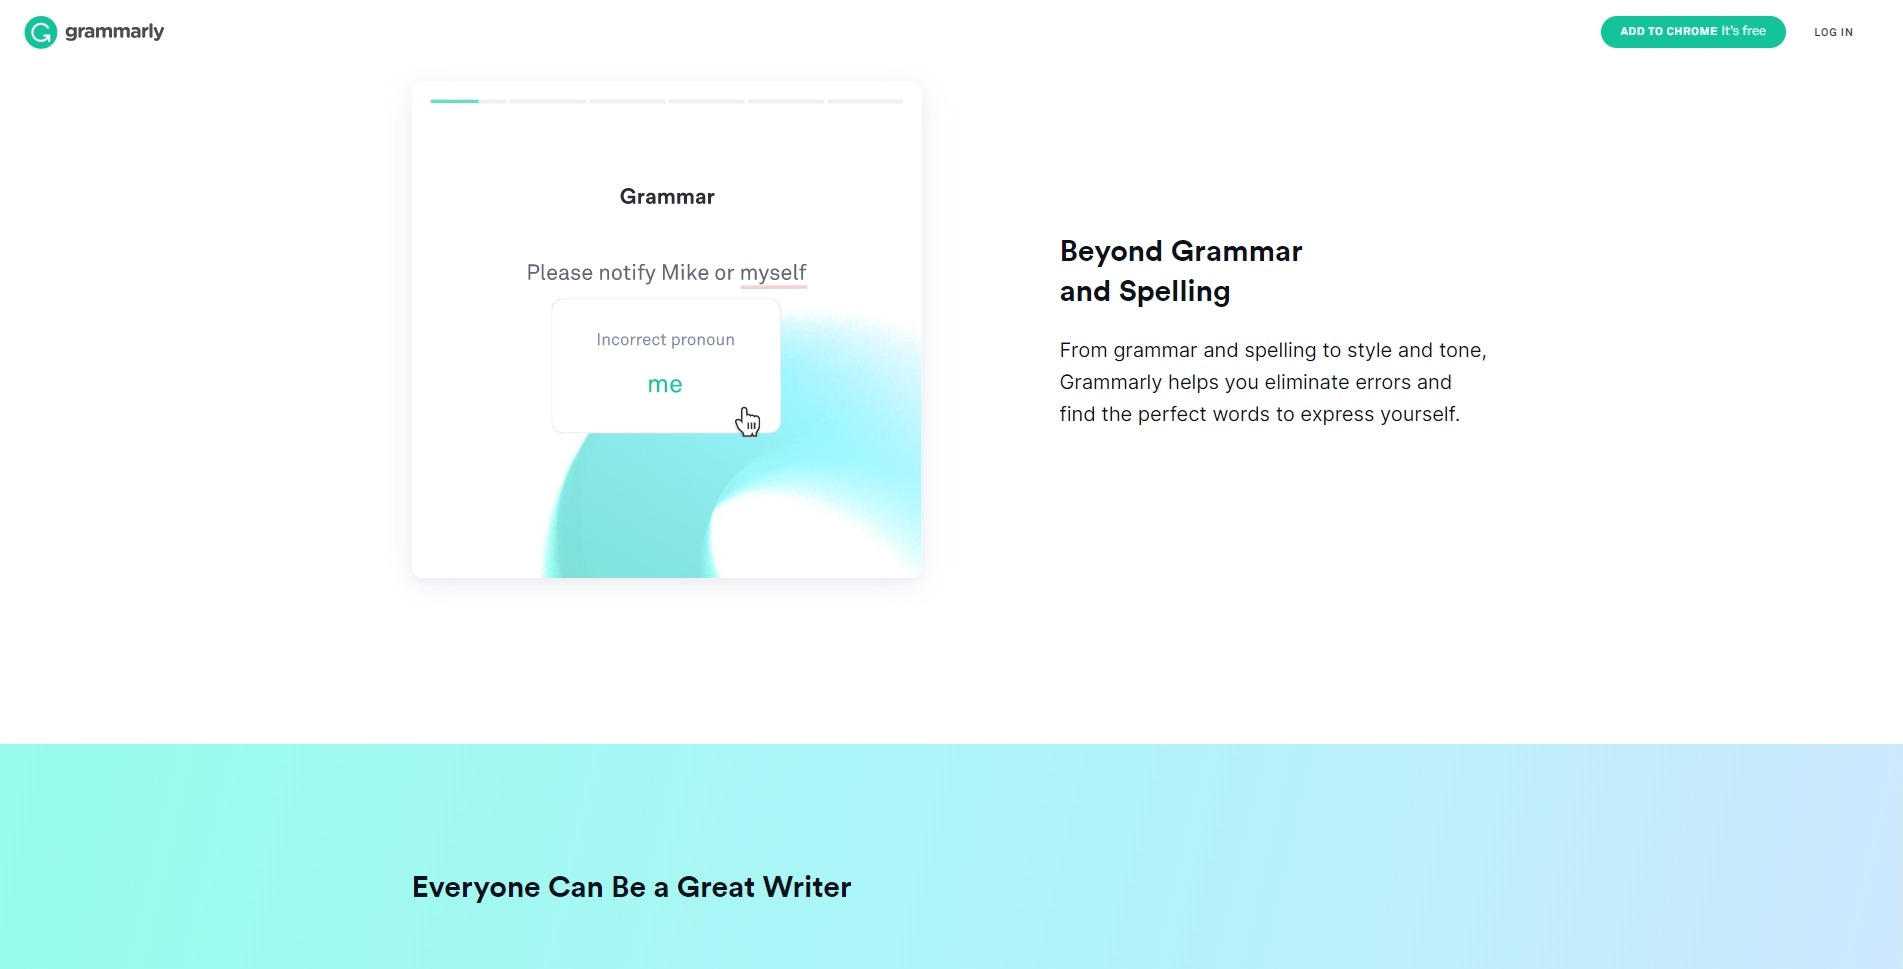 Проверка грамматики онлайн: Grammarly